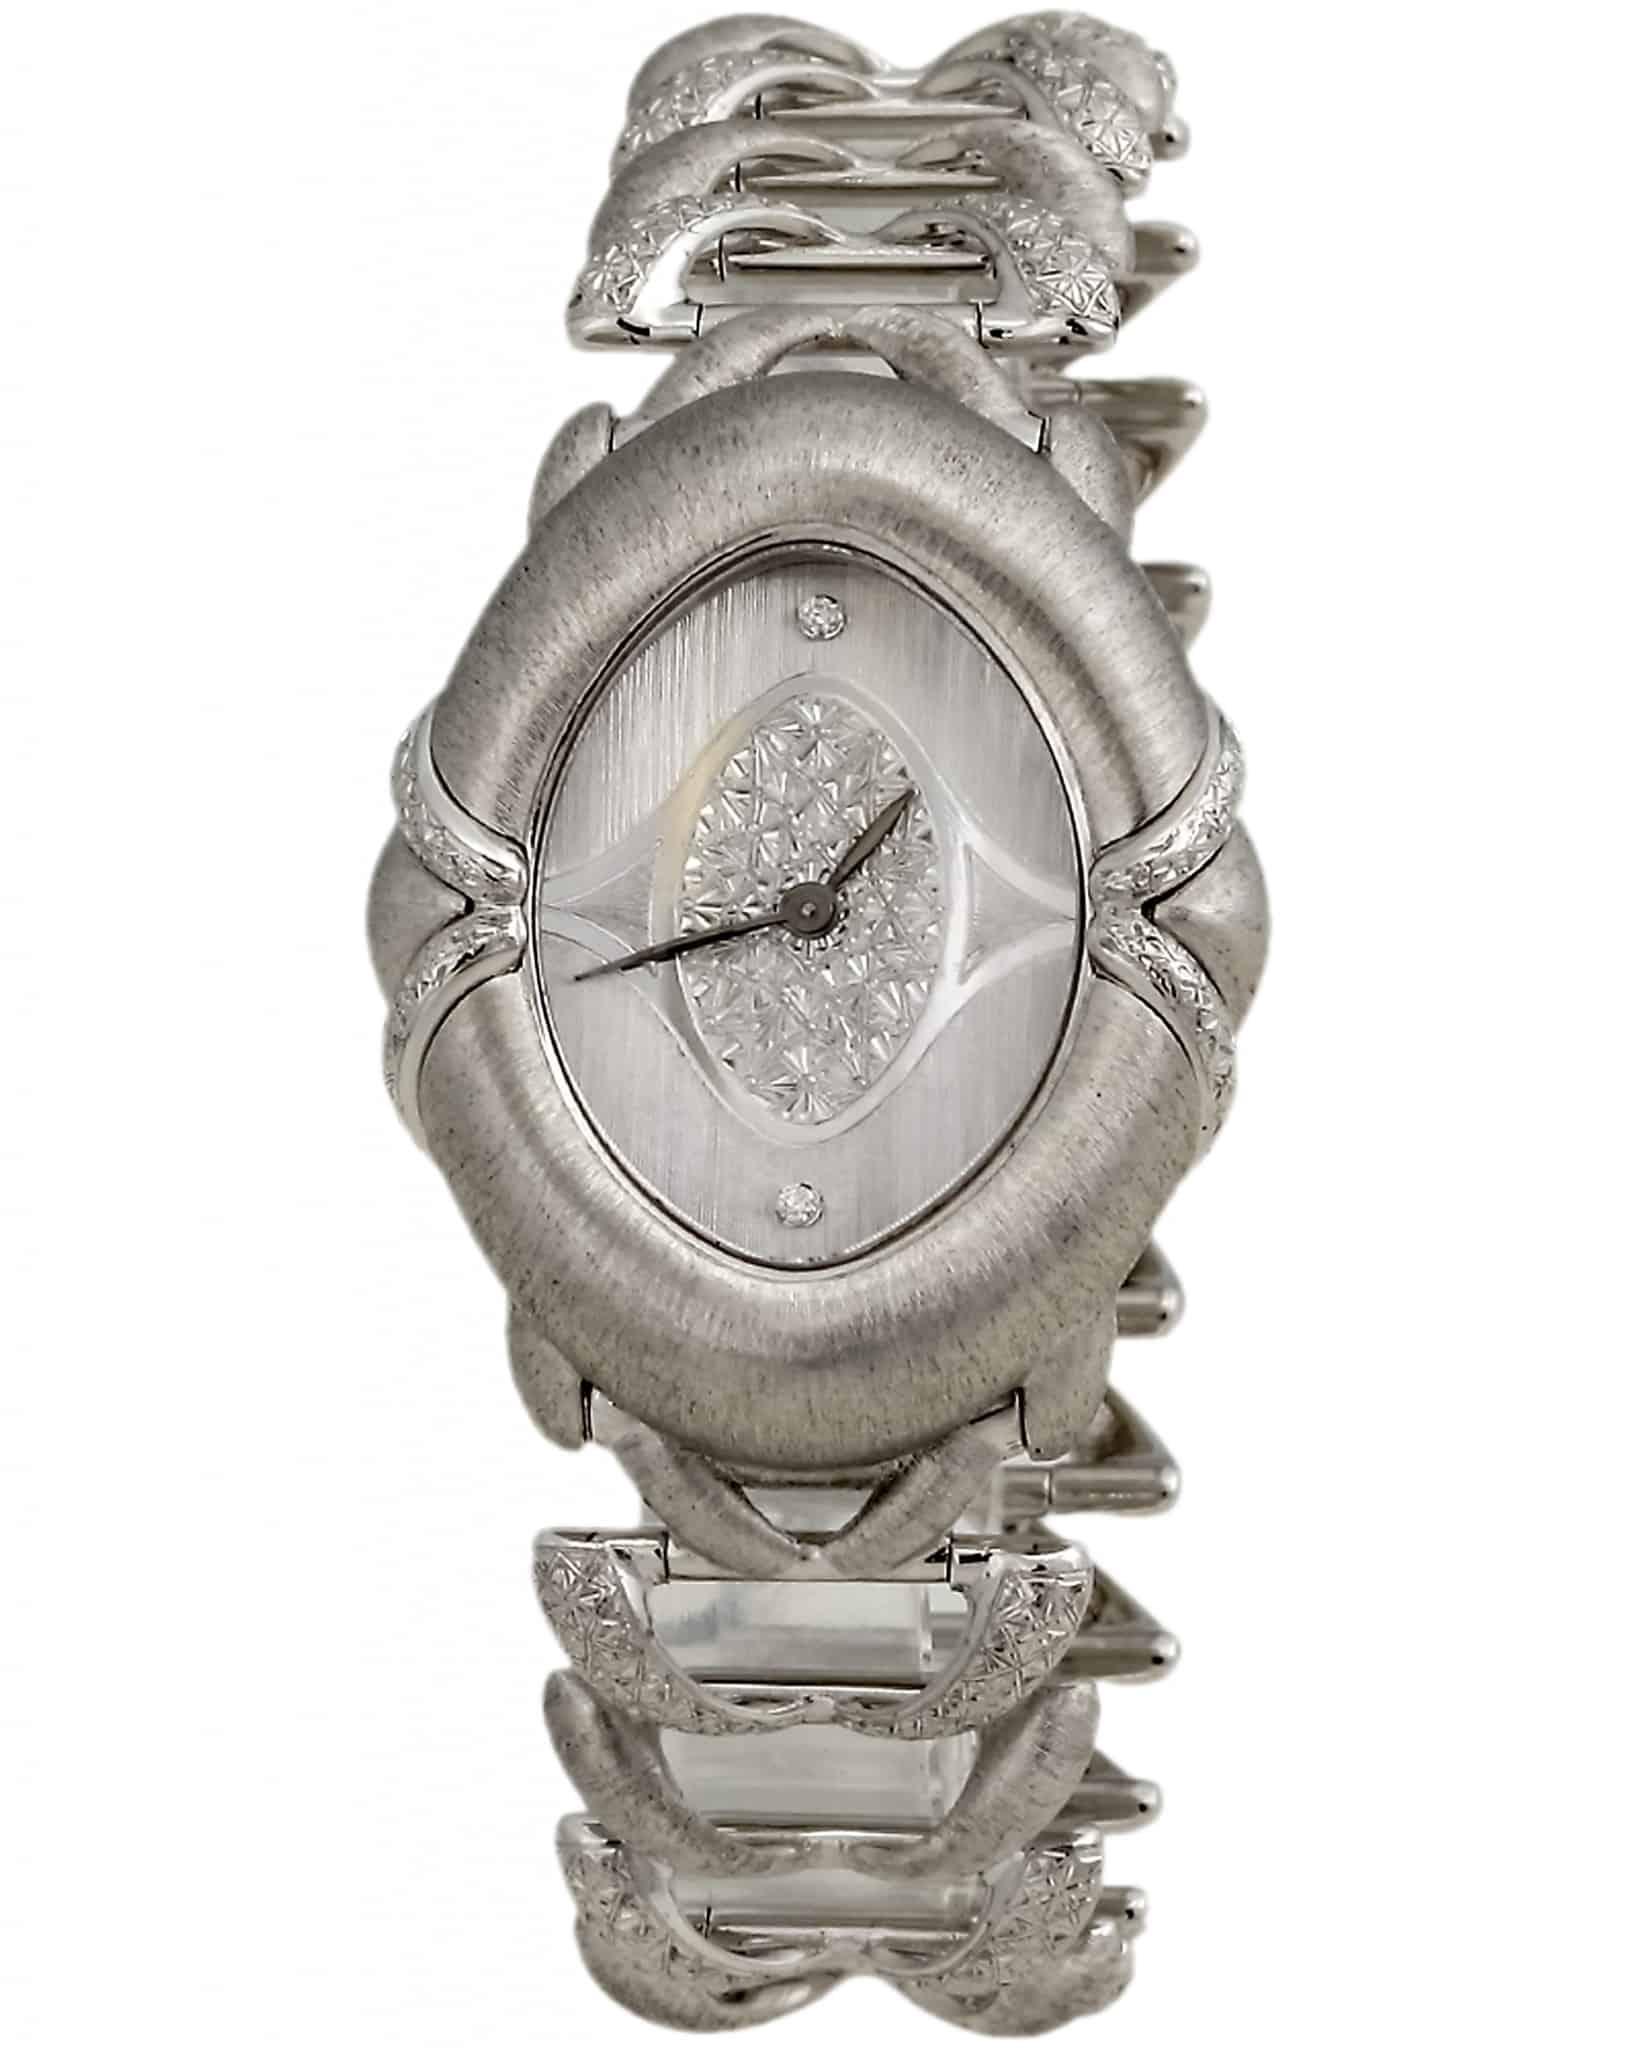 BUCCELLATI Olympochron 18K White Gold Quartz Watch 17522D0287W1281